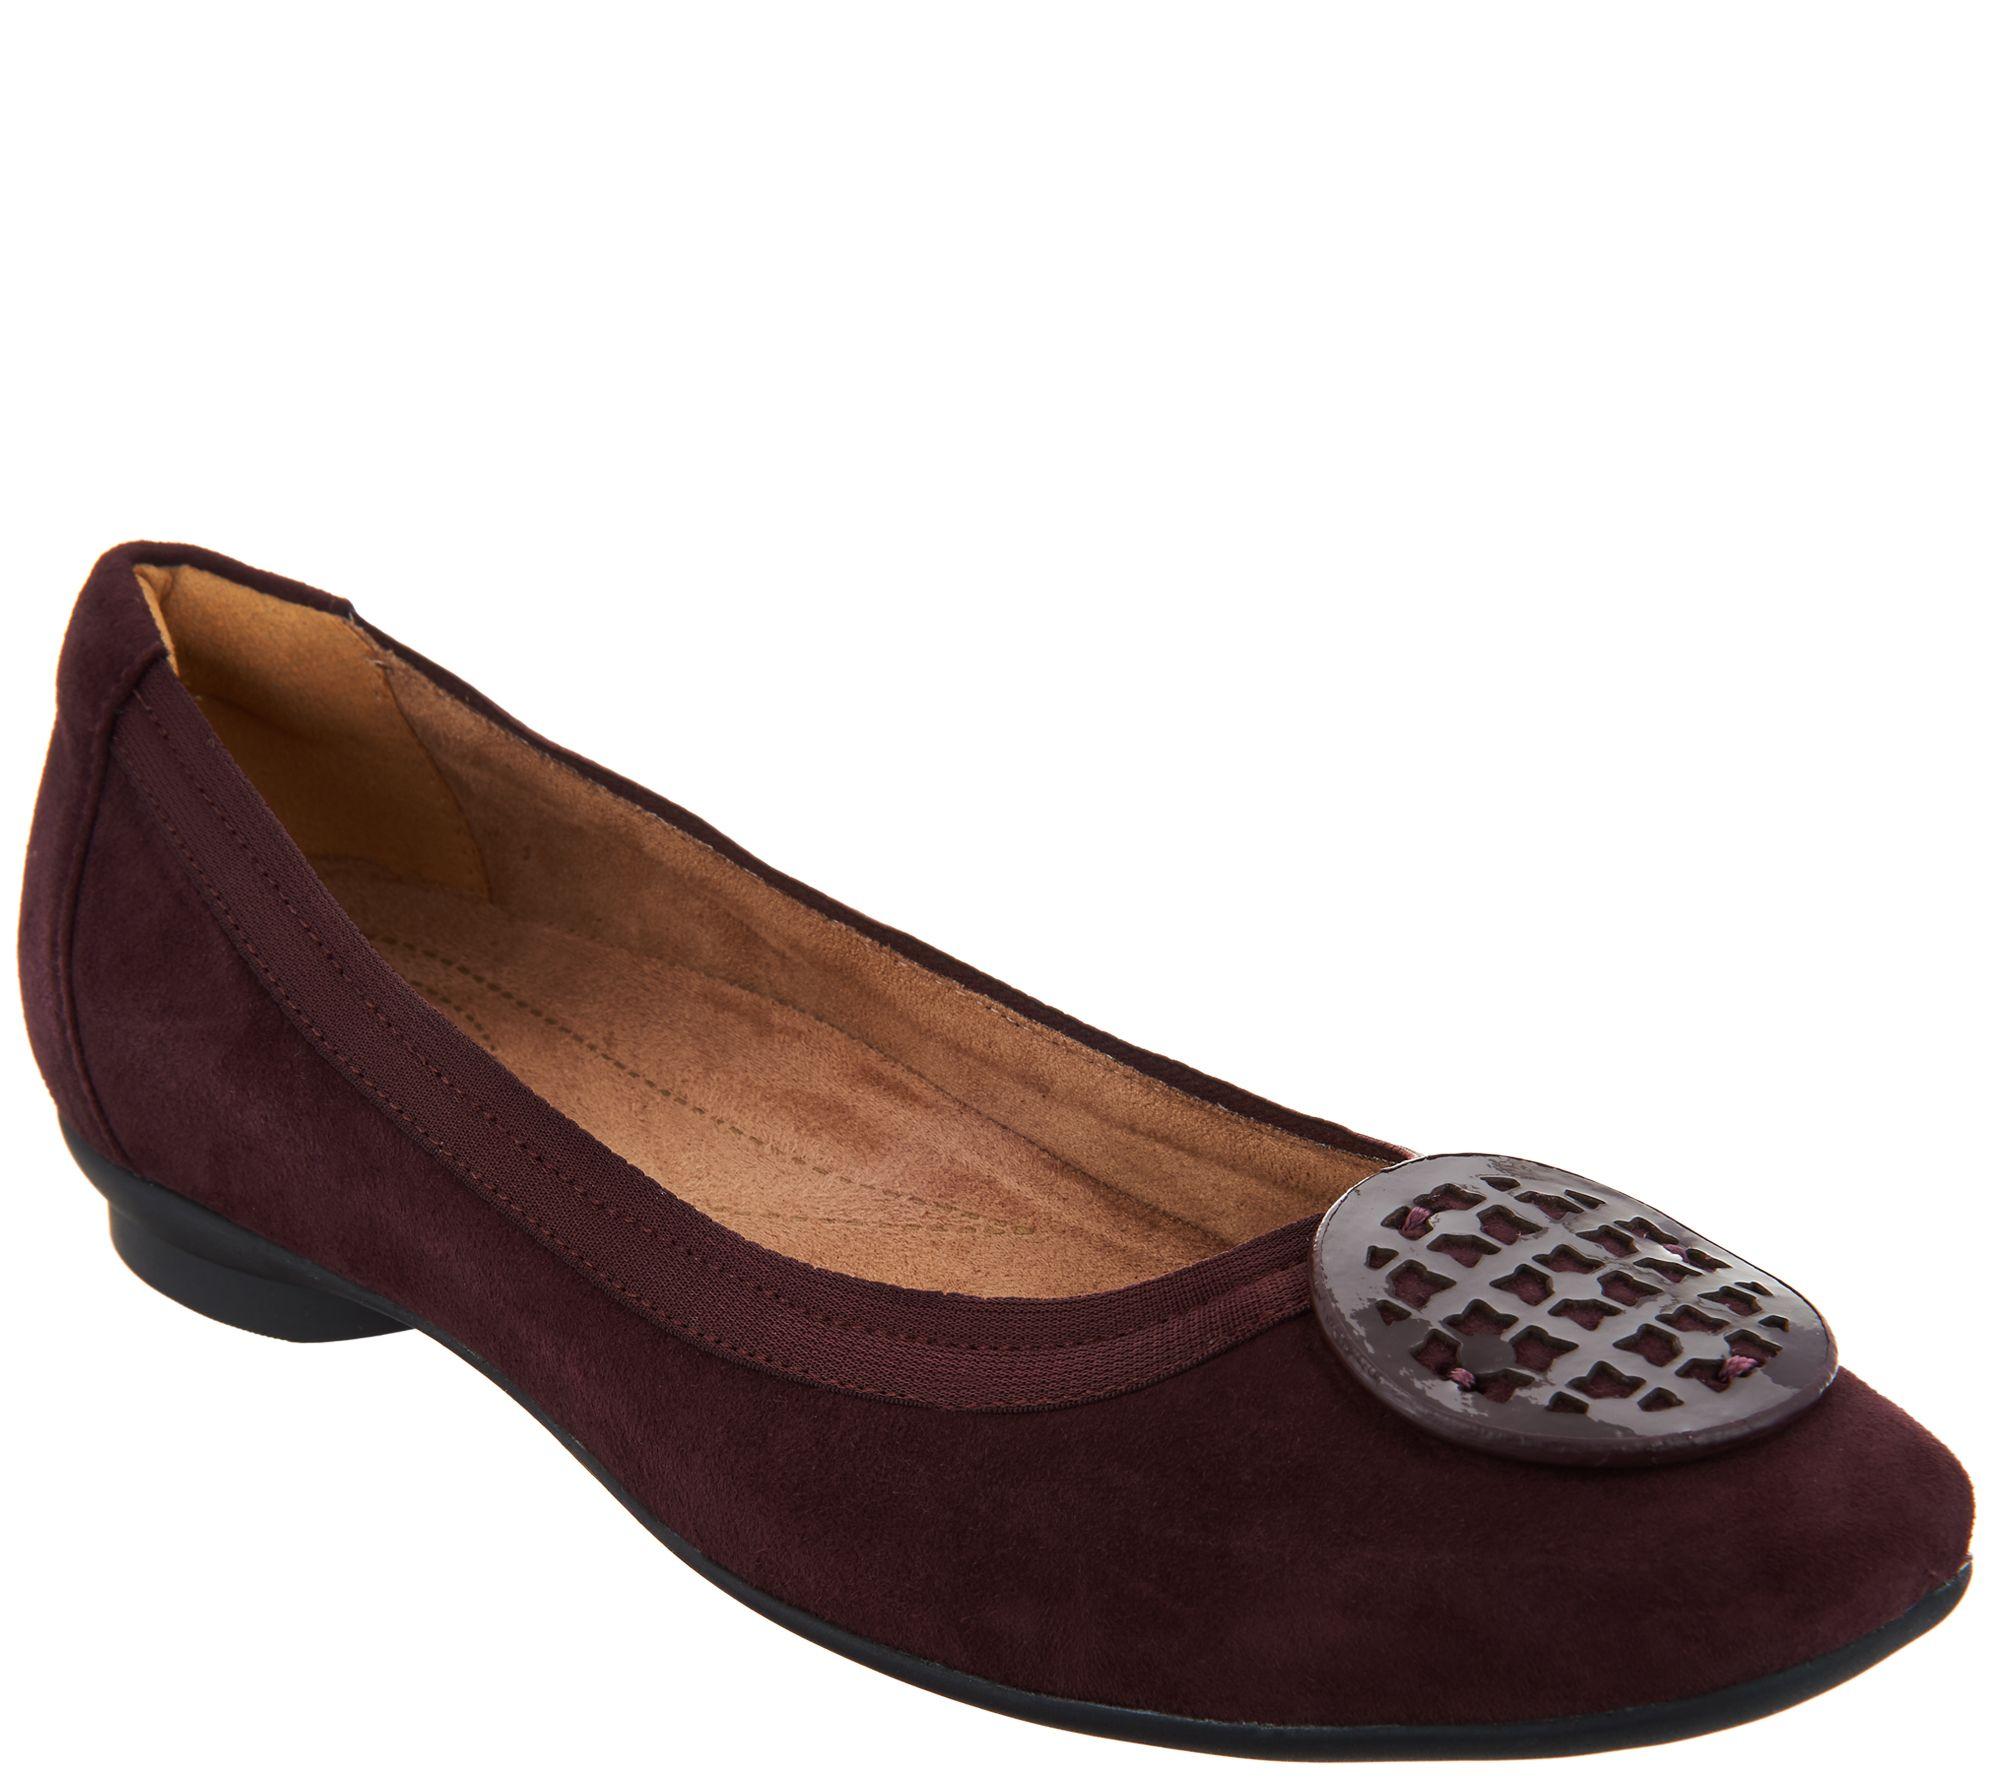 381da8fec Clarks Artisan Leather Ballet Flats - Candra Blush - Page 1 — QVC.com